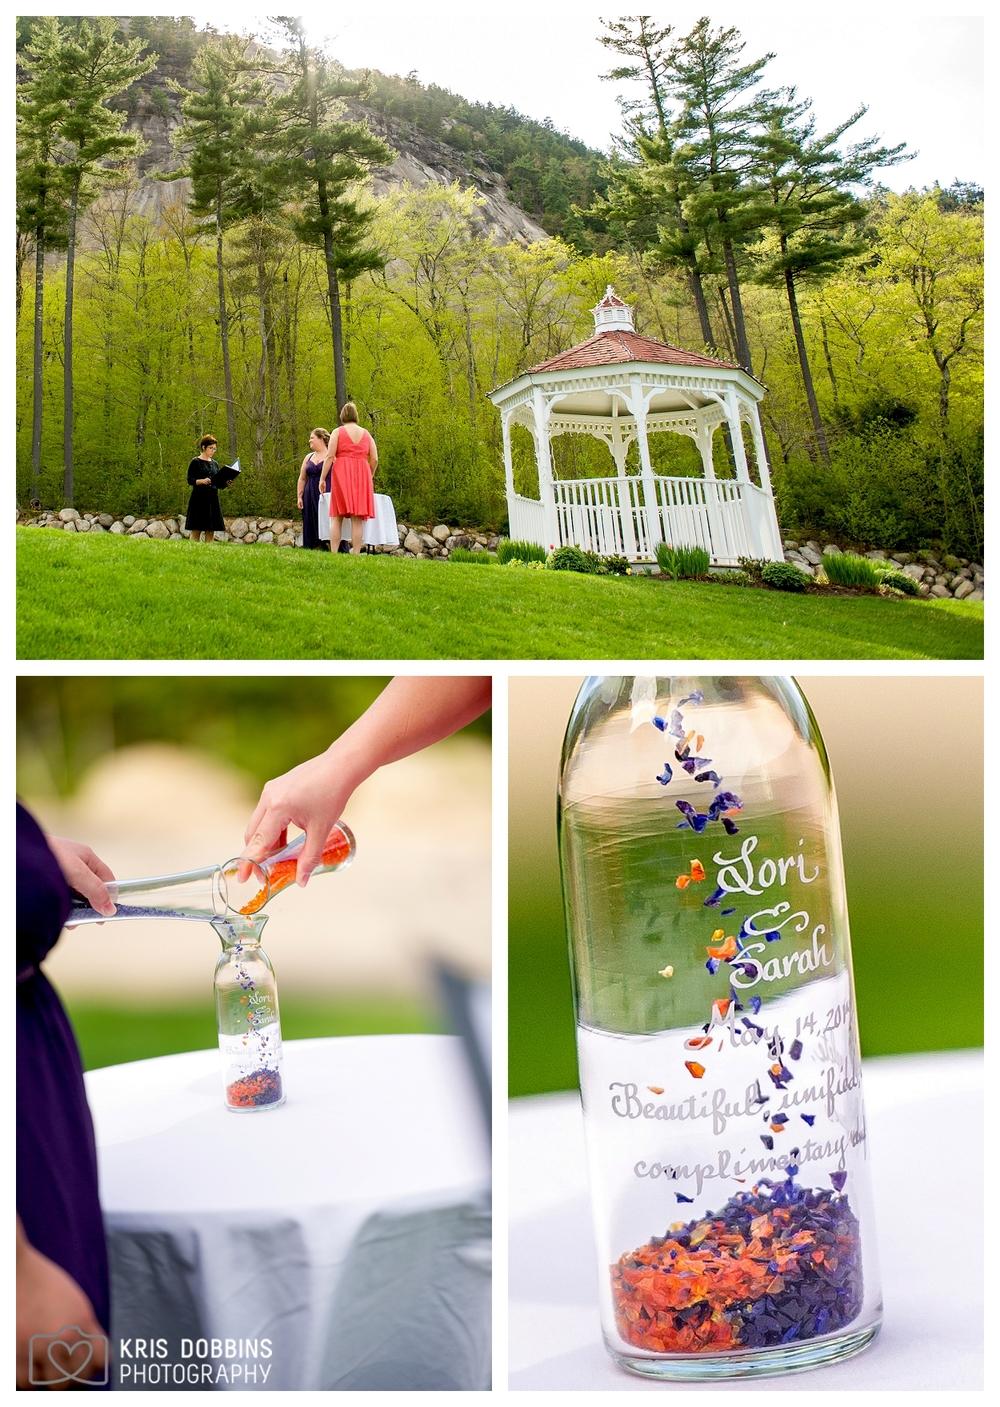 kdp_copyrighted_wedding_image_sl_blog_0040.jpg